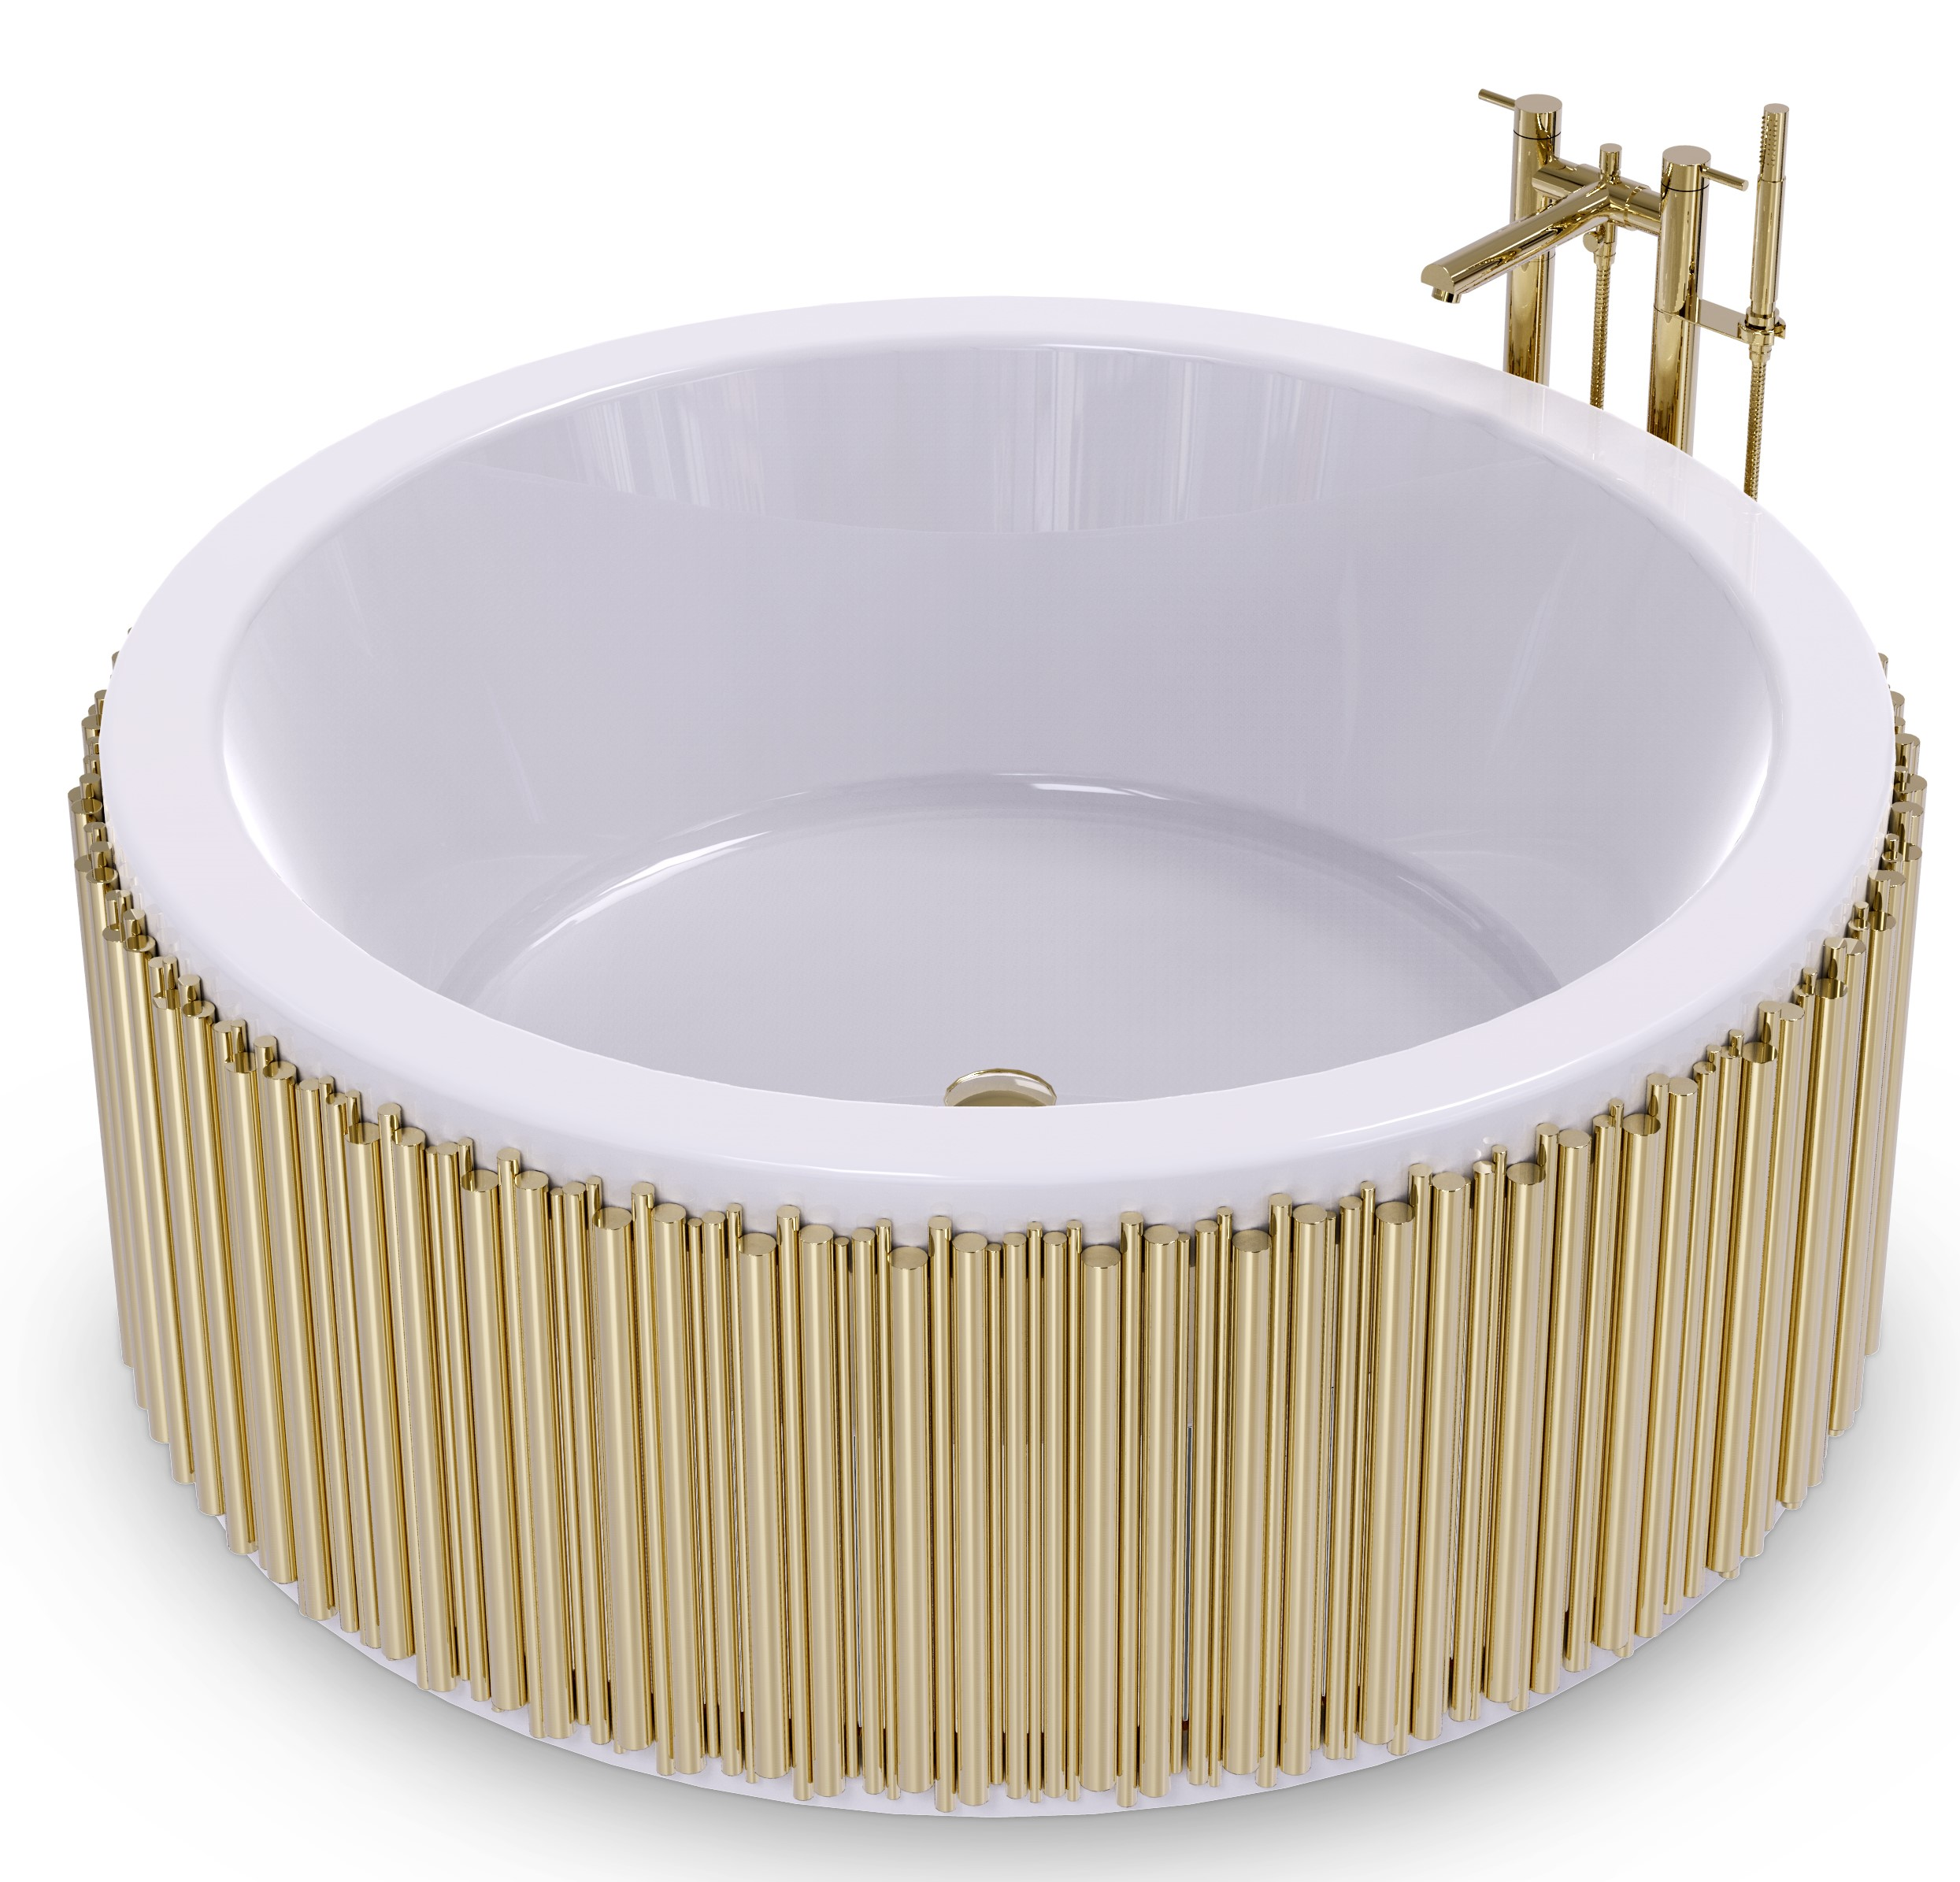 Bathroom Trends, interior design, maison valentina, bathroom design, trends for 2019 bathroom trends Shop the Look - Bathroom Trends by Maison Valentina symphony bathtub 2 HR